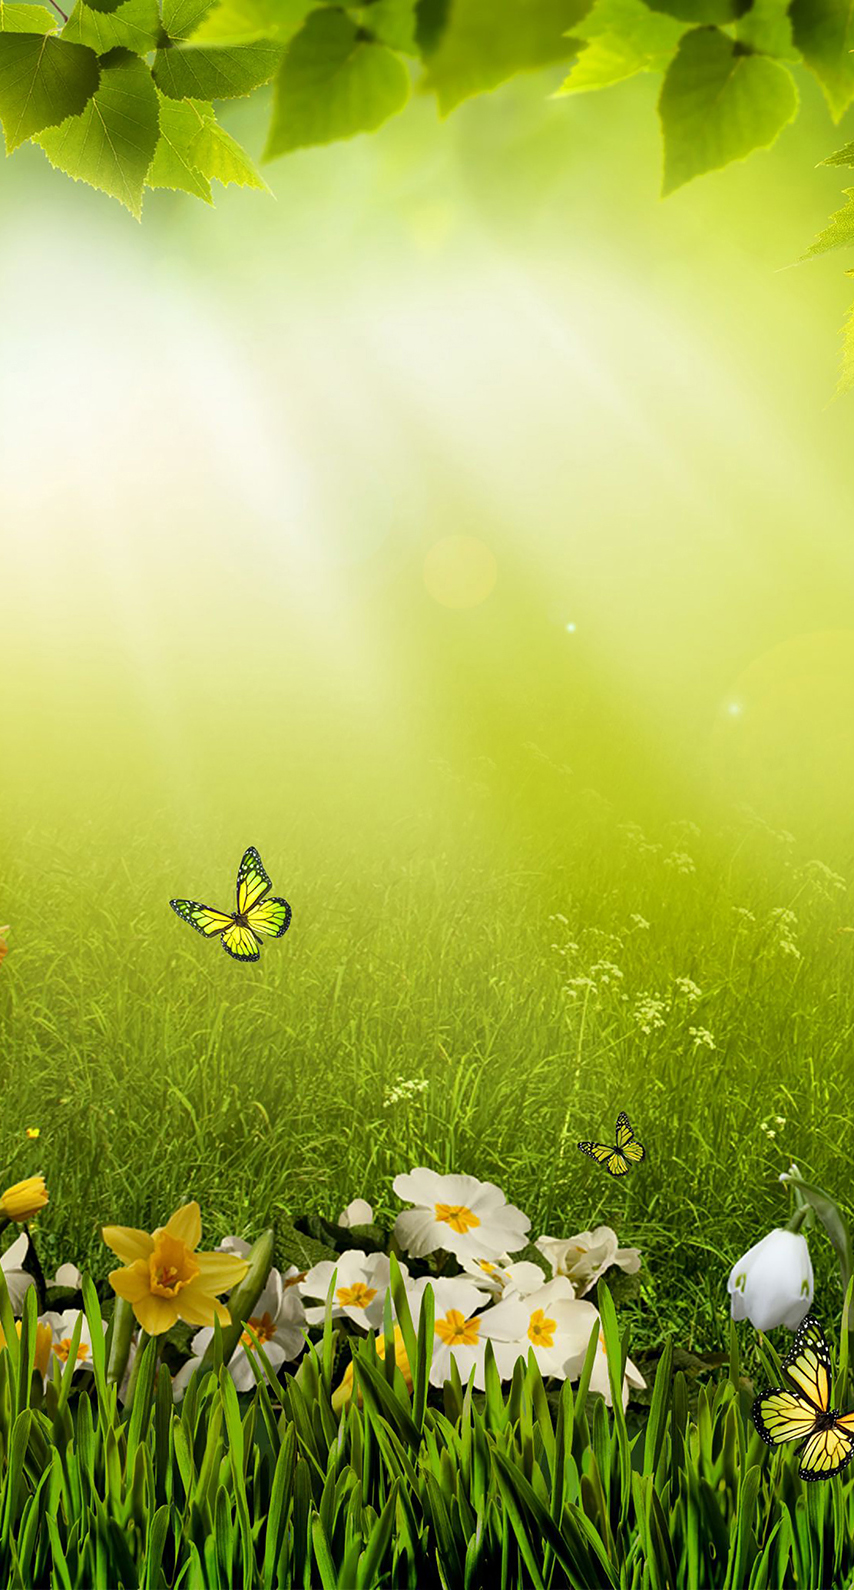 bright, spring, meadow, summer, morning, park, sun, no person, dawn, fair weather